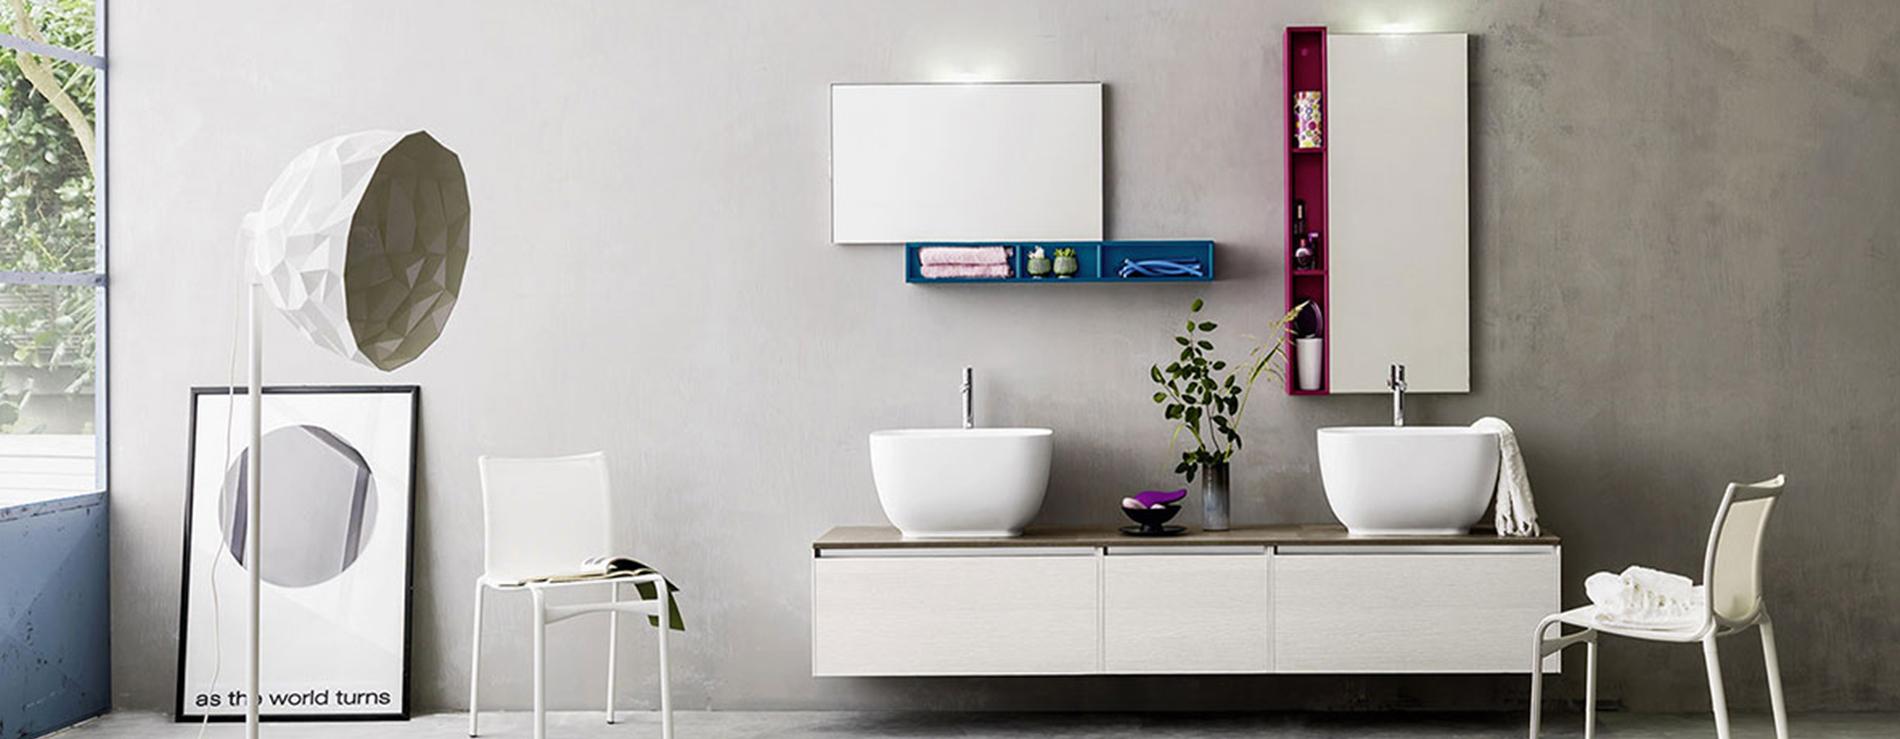 Arredo bagno mobili bagno centro mobili godiasco for Arbi arredo bagno catalogo